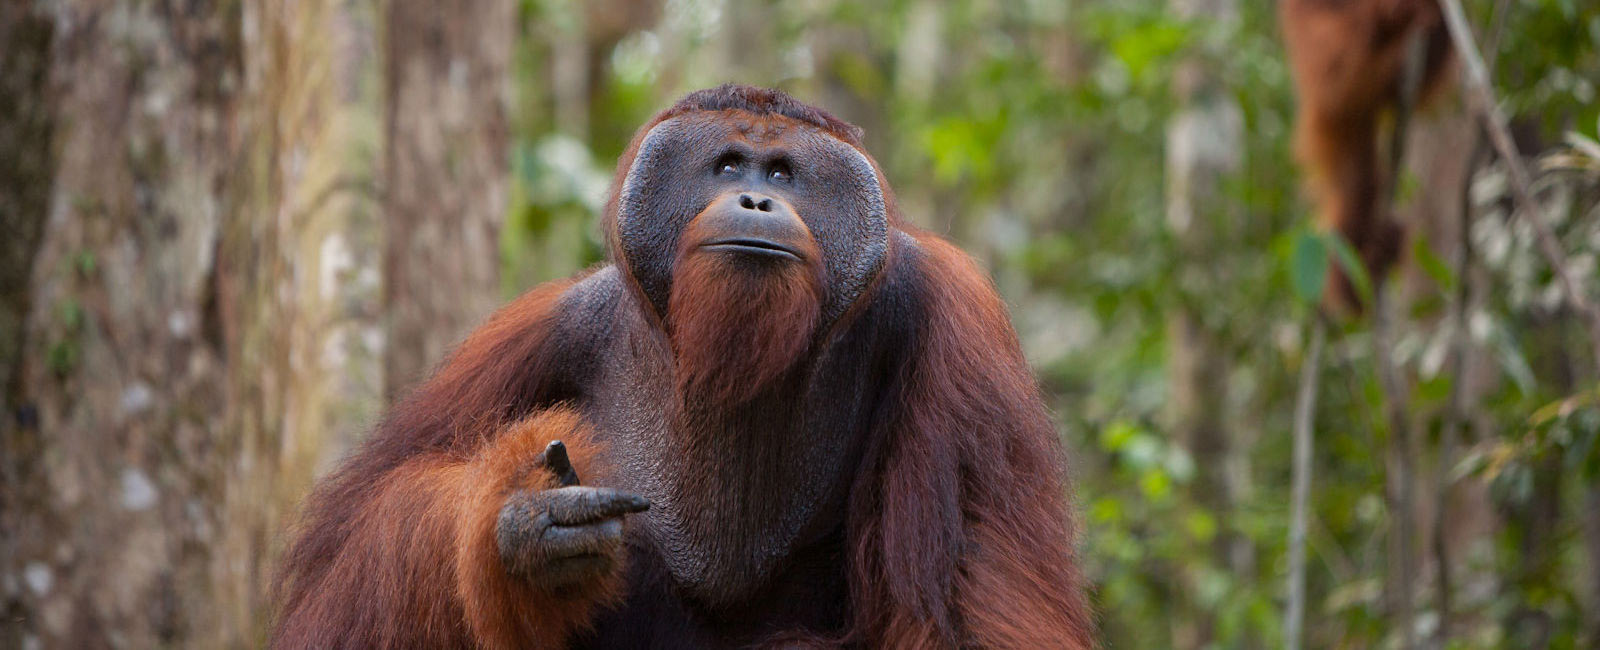 Volunteering in Southeast Asia may help orangutans. Photo: OFI